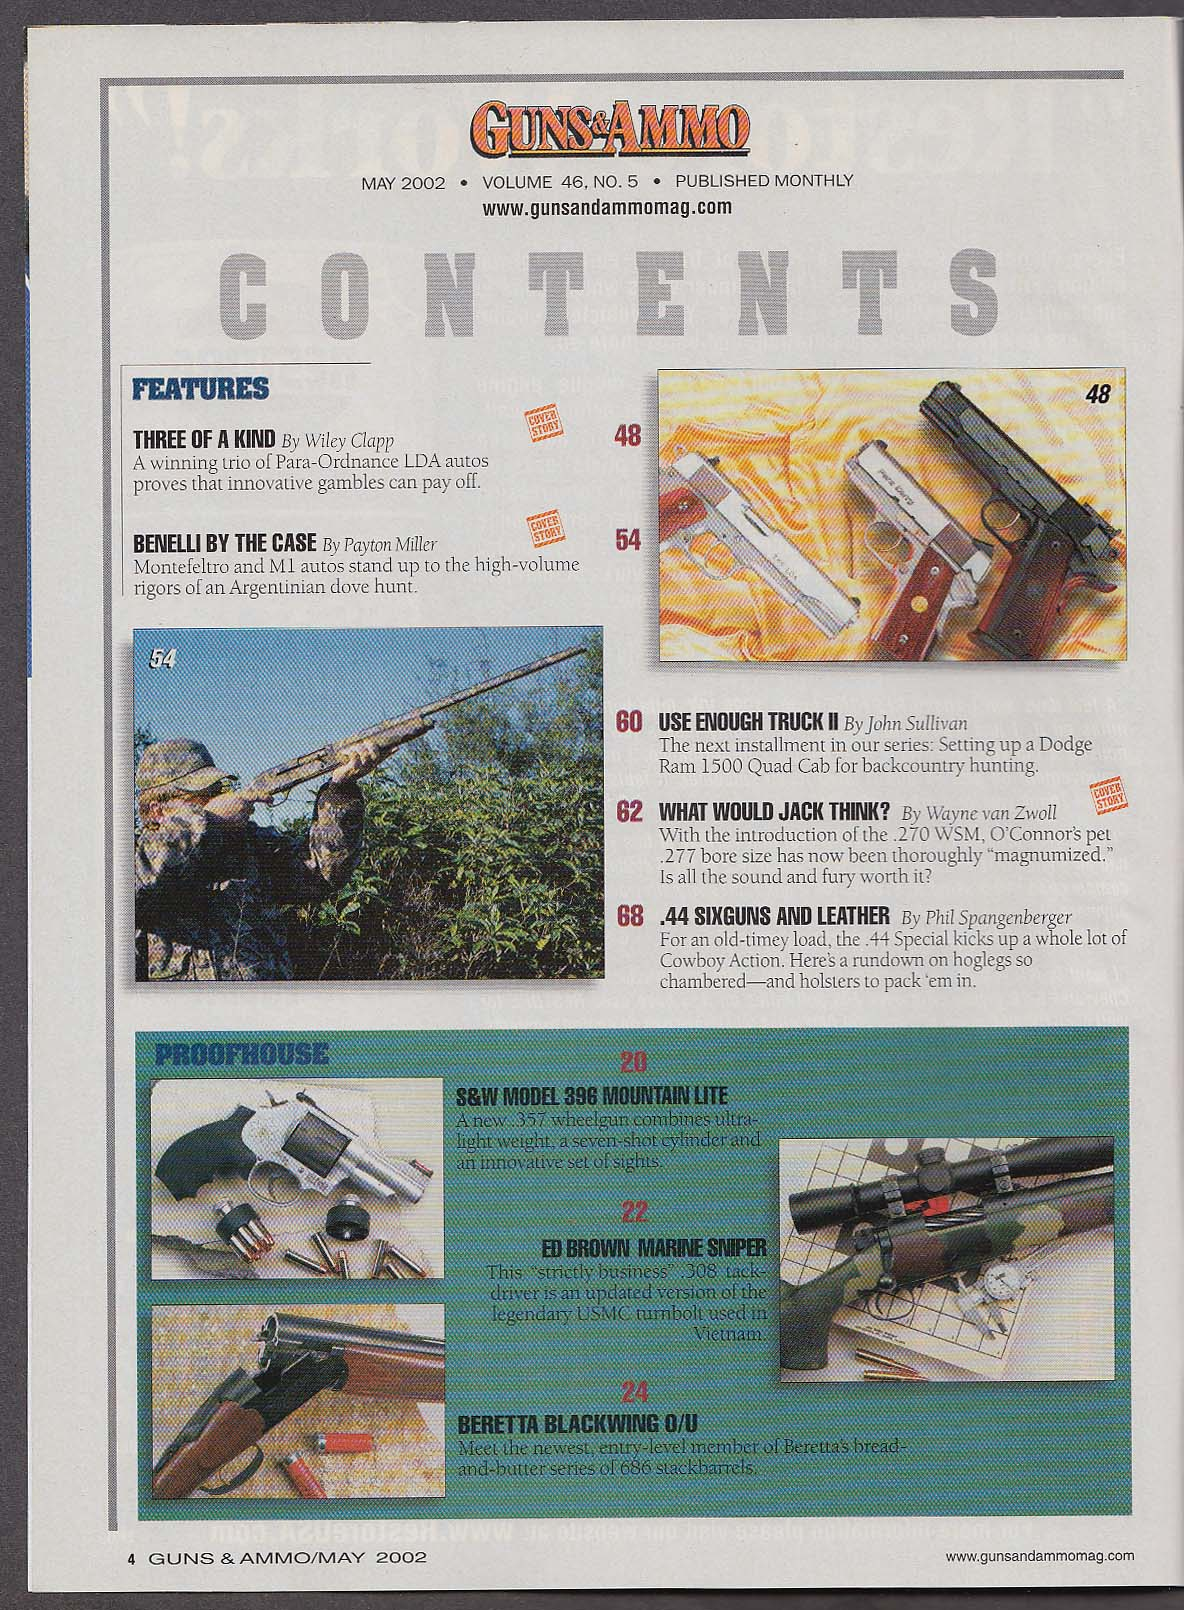 Image for GUNS & AMMO Para-Ordnance LDA Benelli M1 .44 Special + 5 2002